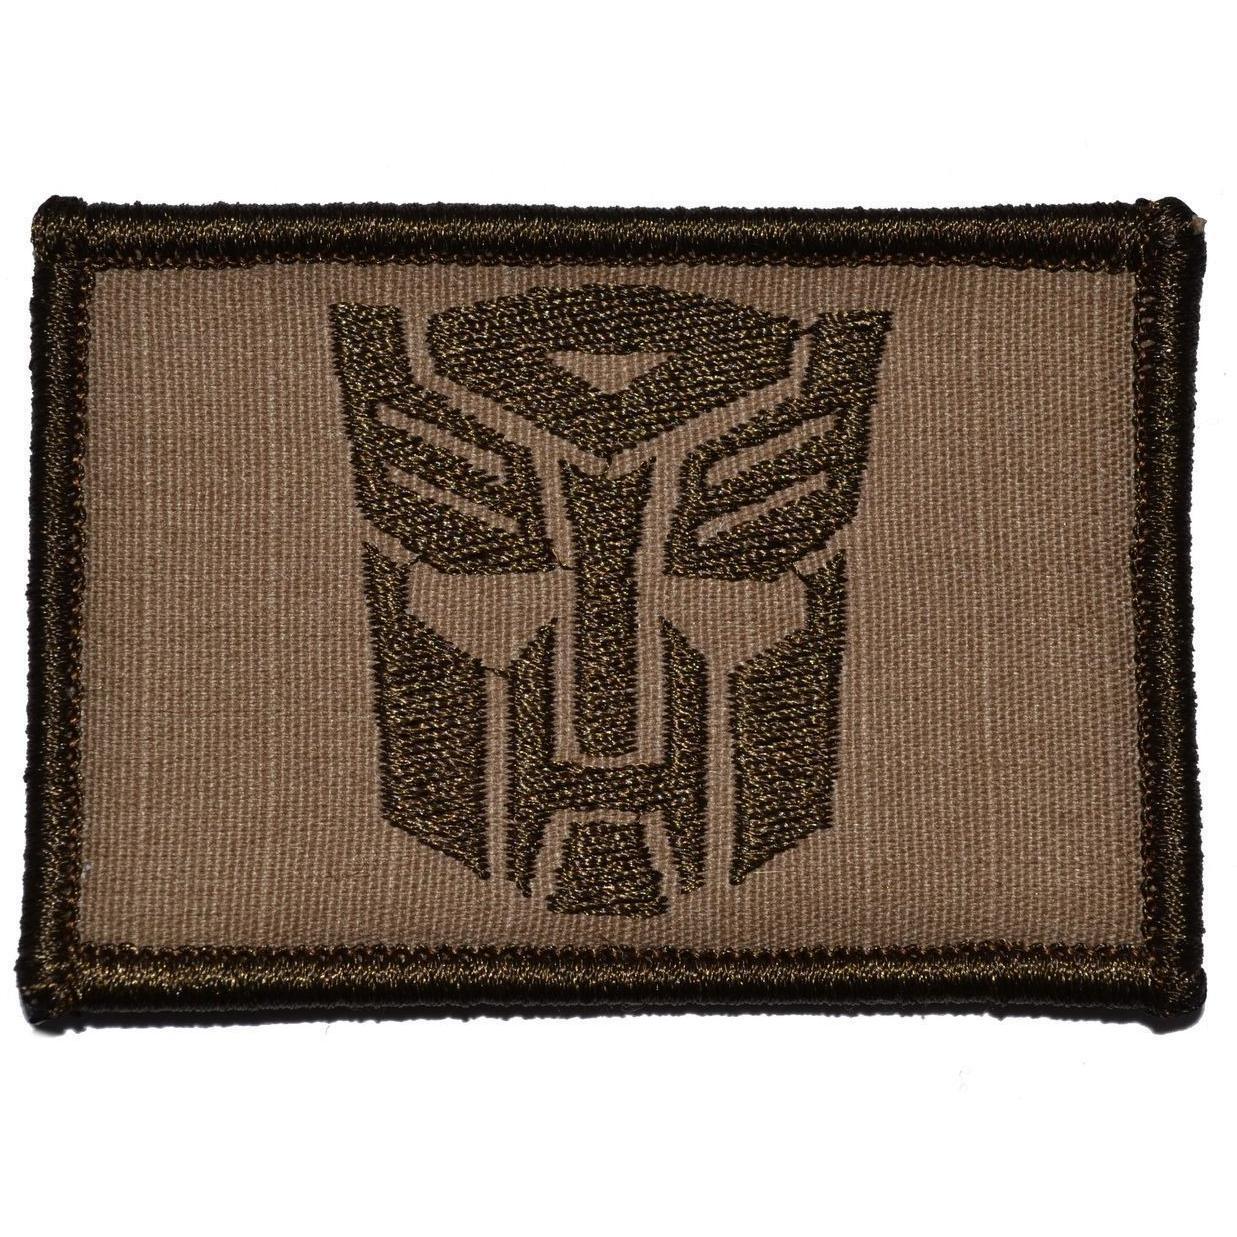 Autobot Transformers - 2x3 Patch